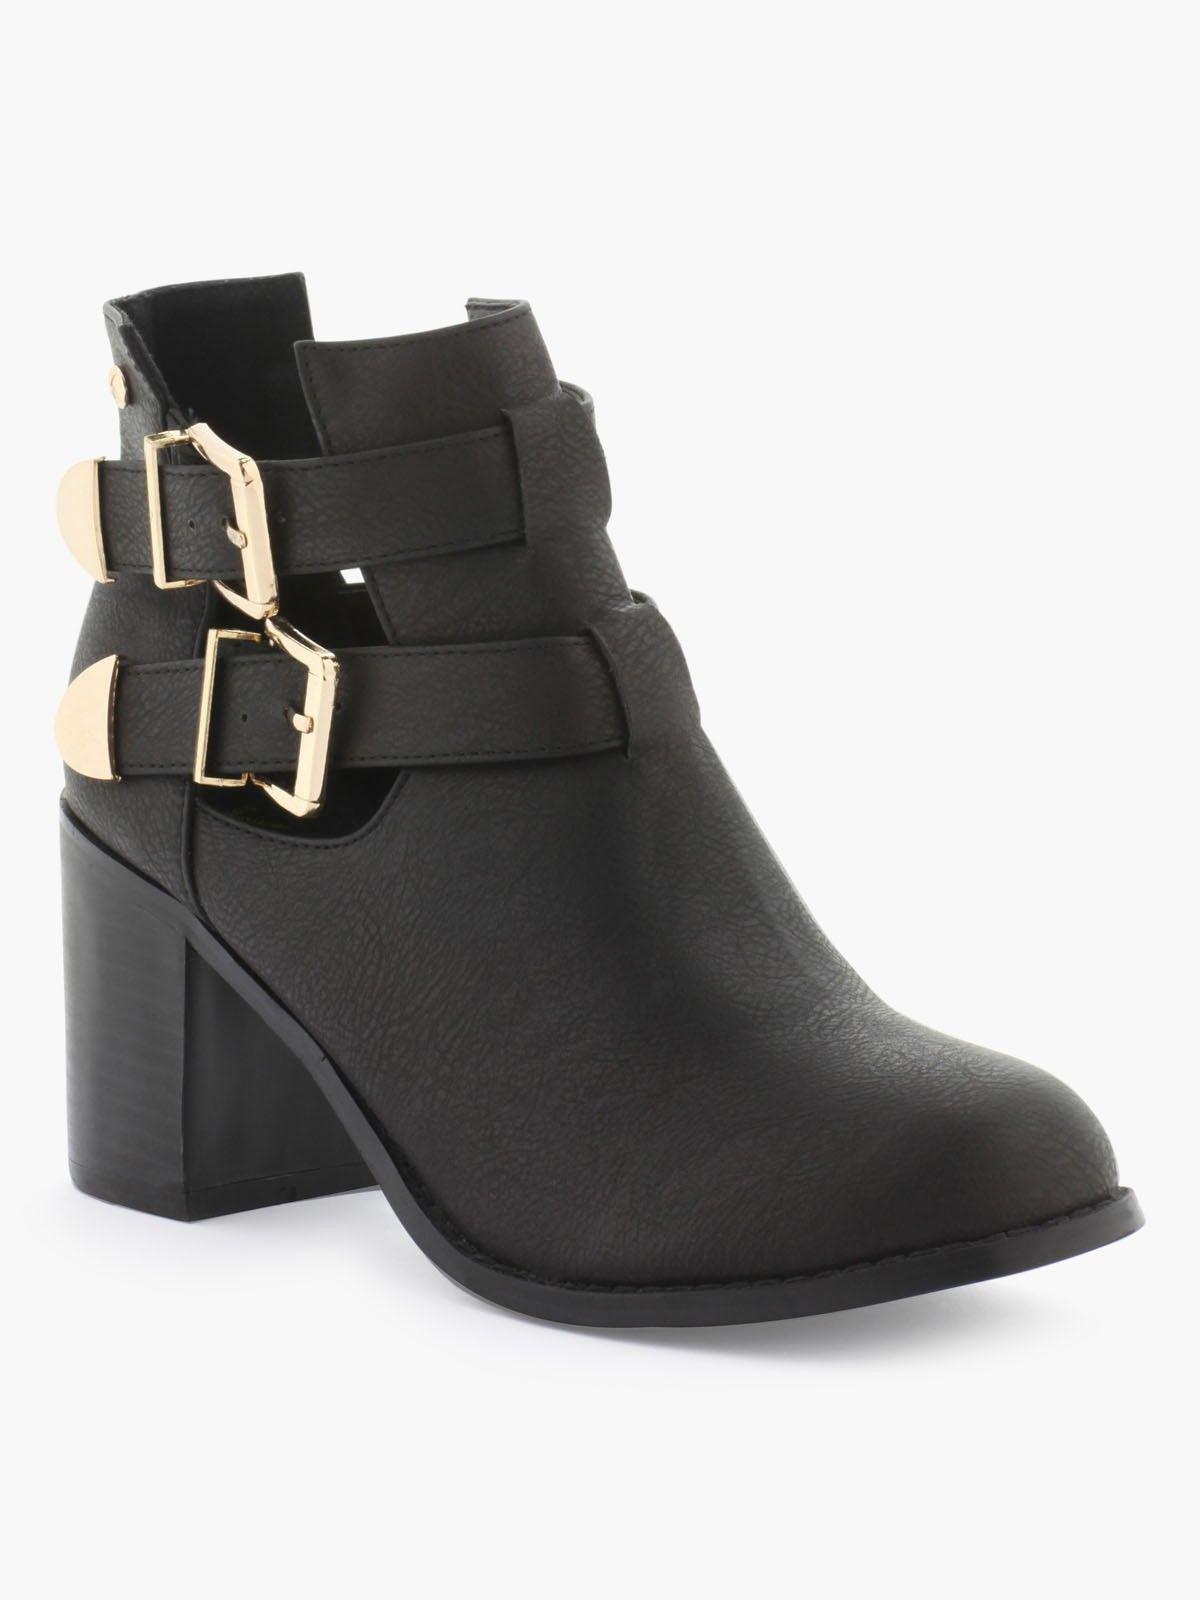 bottines avec zip | bottines femmes, bottines et chaussure